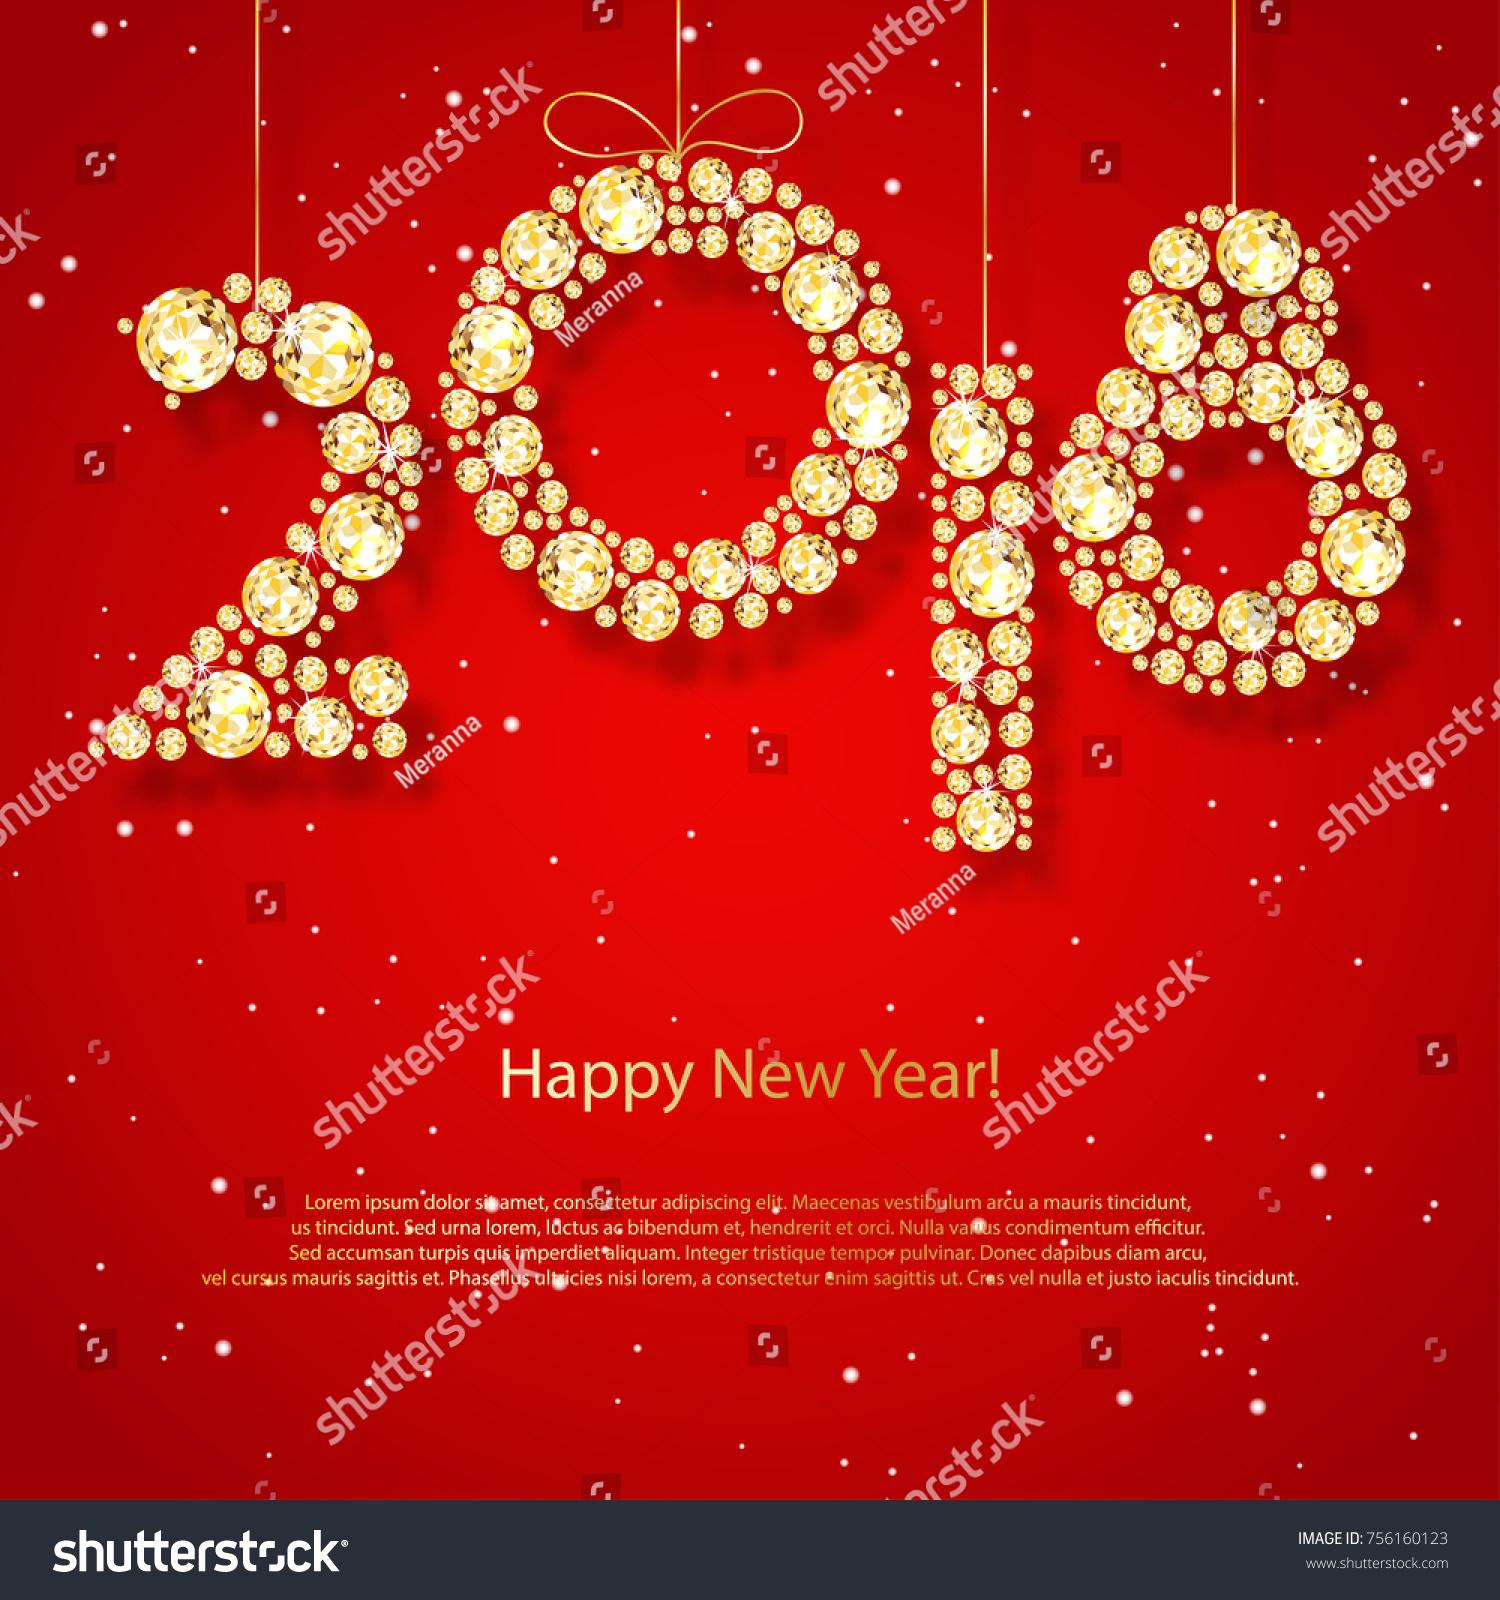 2018 Happy New Year Holiday Greeting Stock Photo Photo Vector